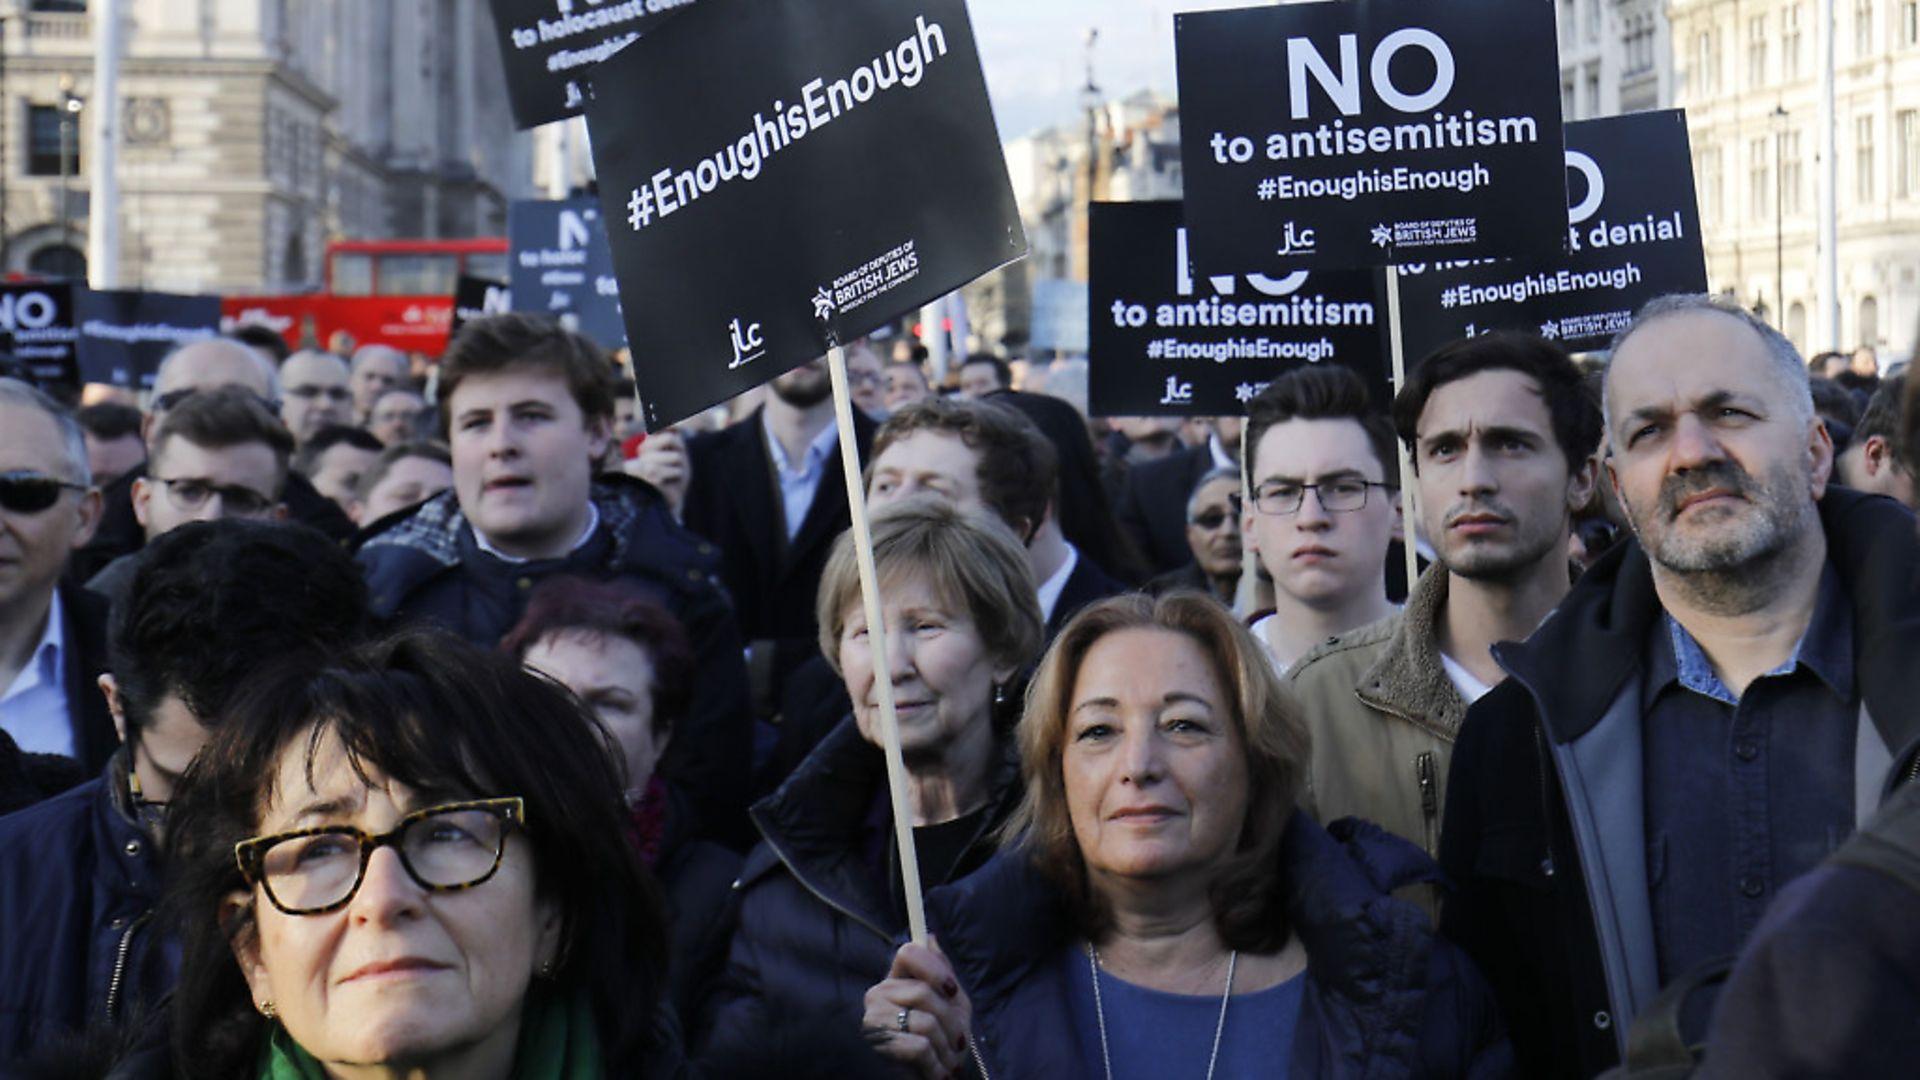 Members of the Jewish community hold a protest against anti-semitism. Photo: TOLGA AKMEN/AFP via Getty Images - Credit: AFP via Getty Images